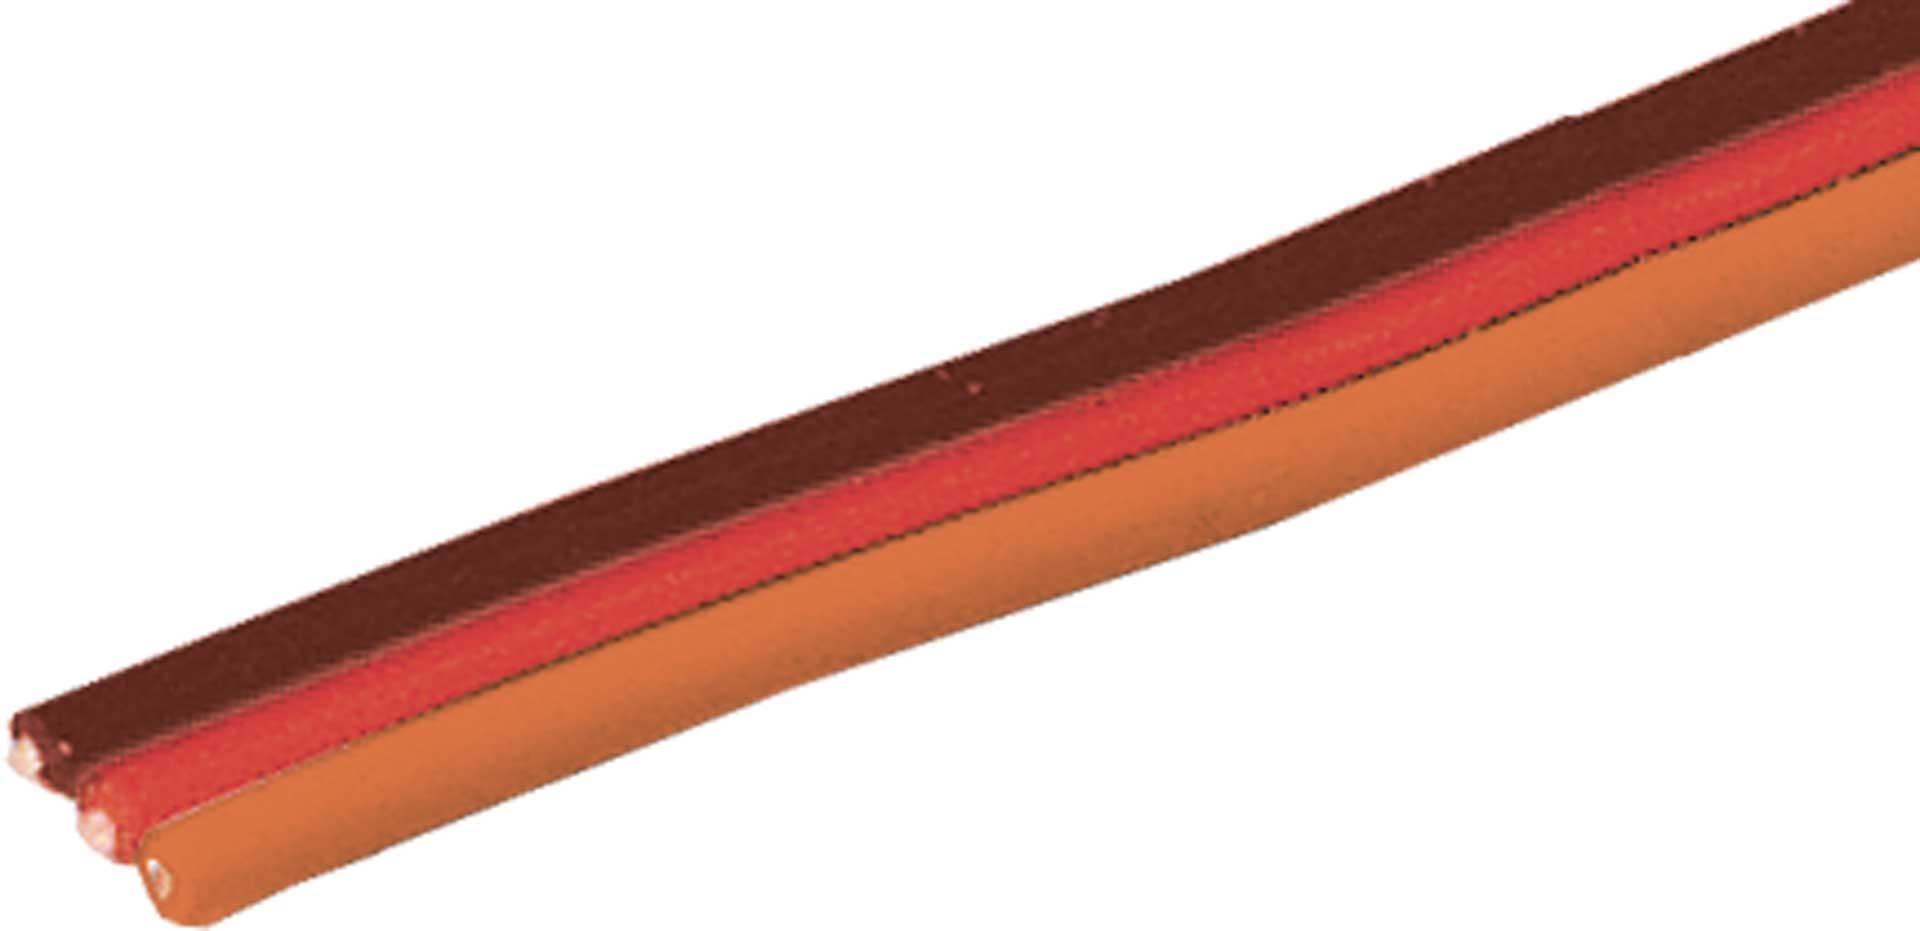 Robbe Modellsport Servokabel Graupner/JR/Uni 100 Meter flach 0,5mm² (20AWG) PVC Meterware